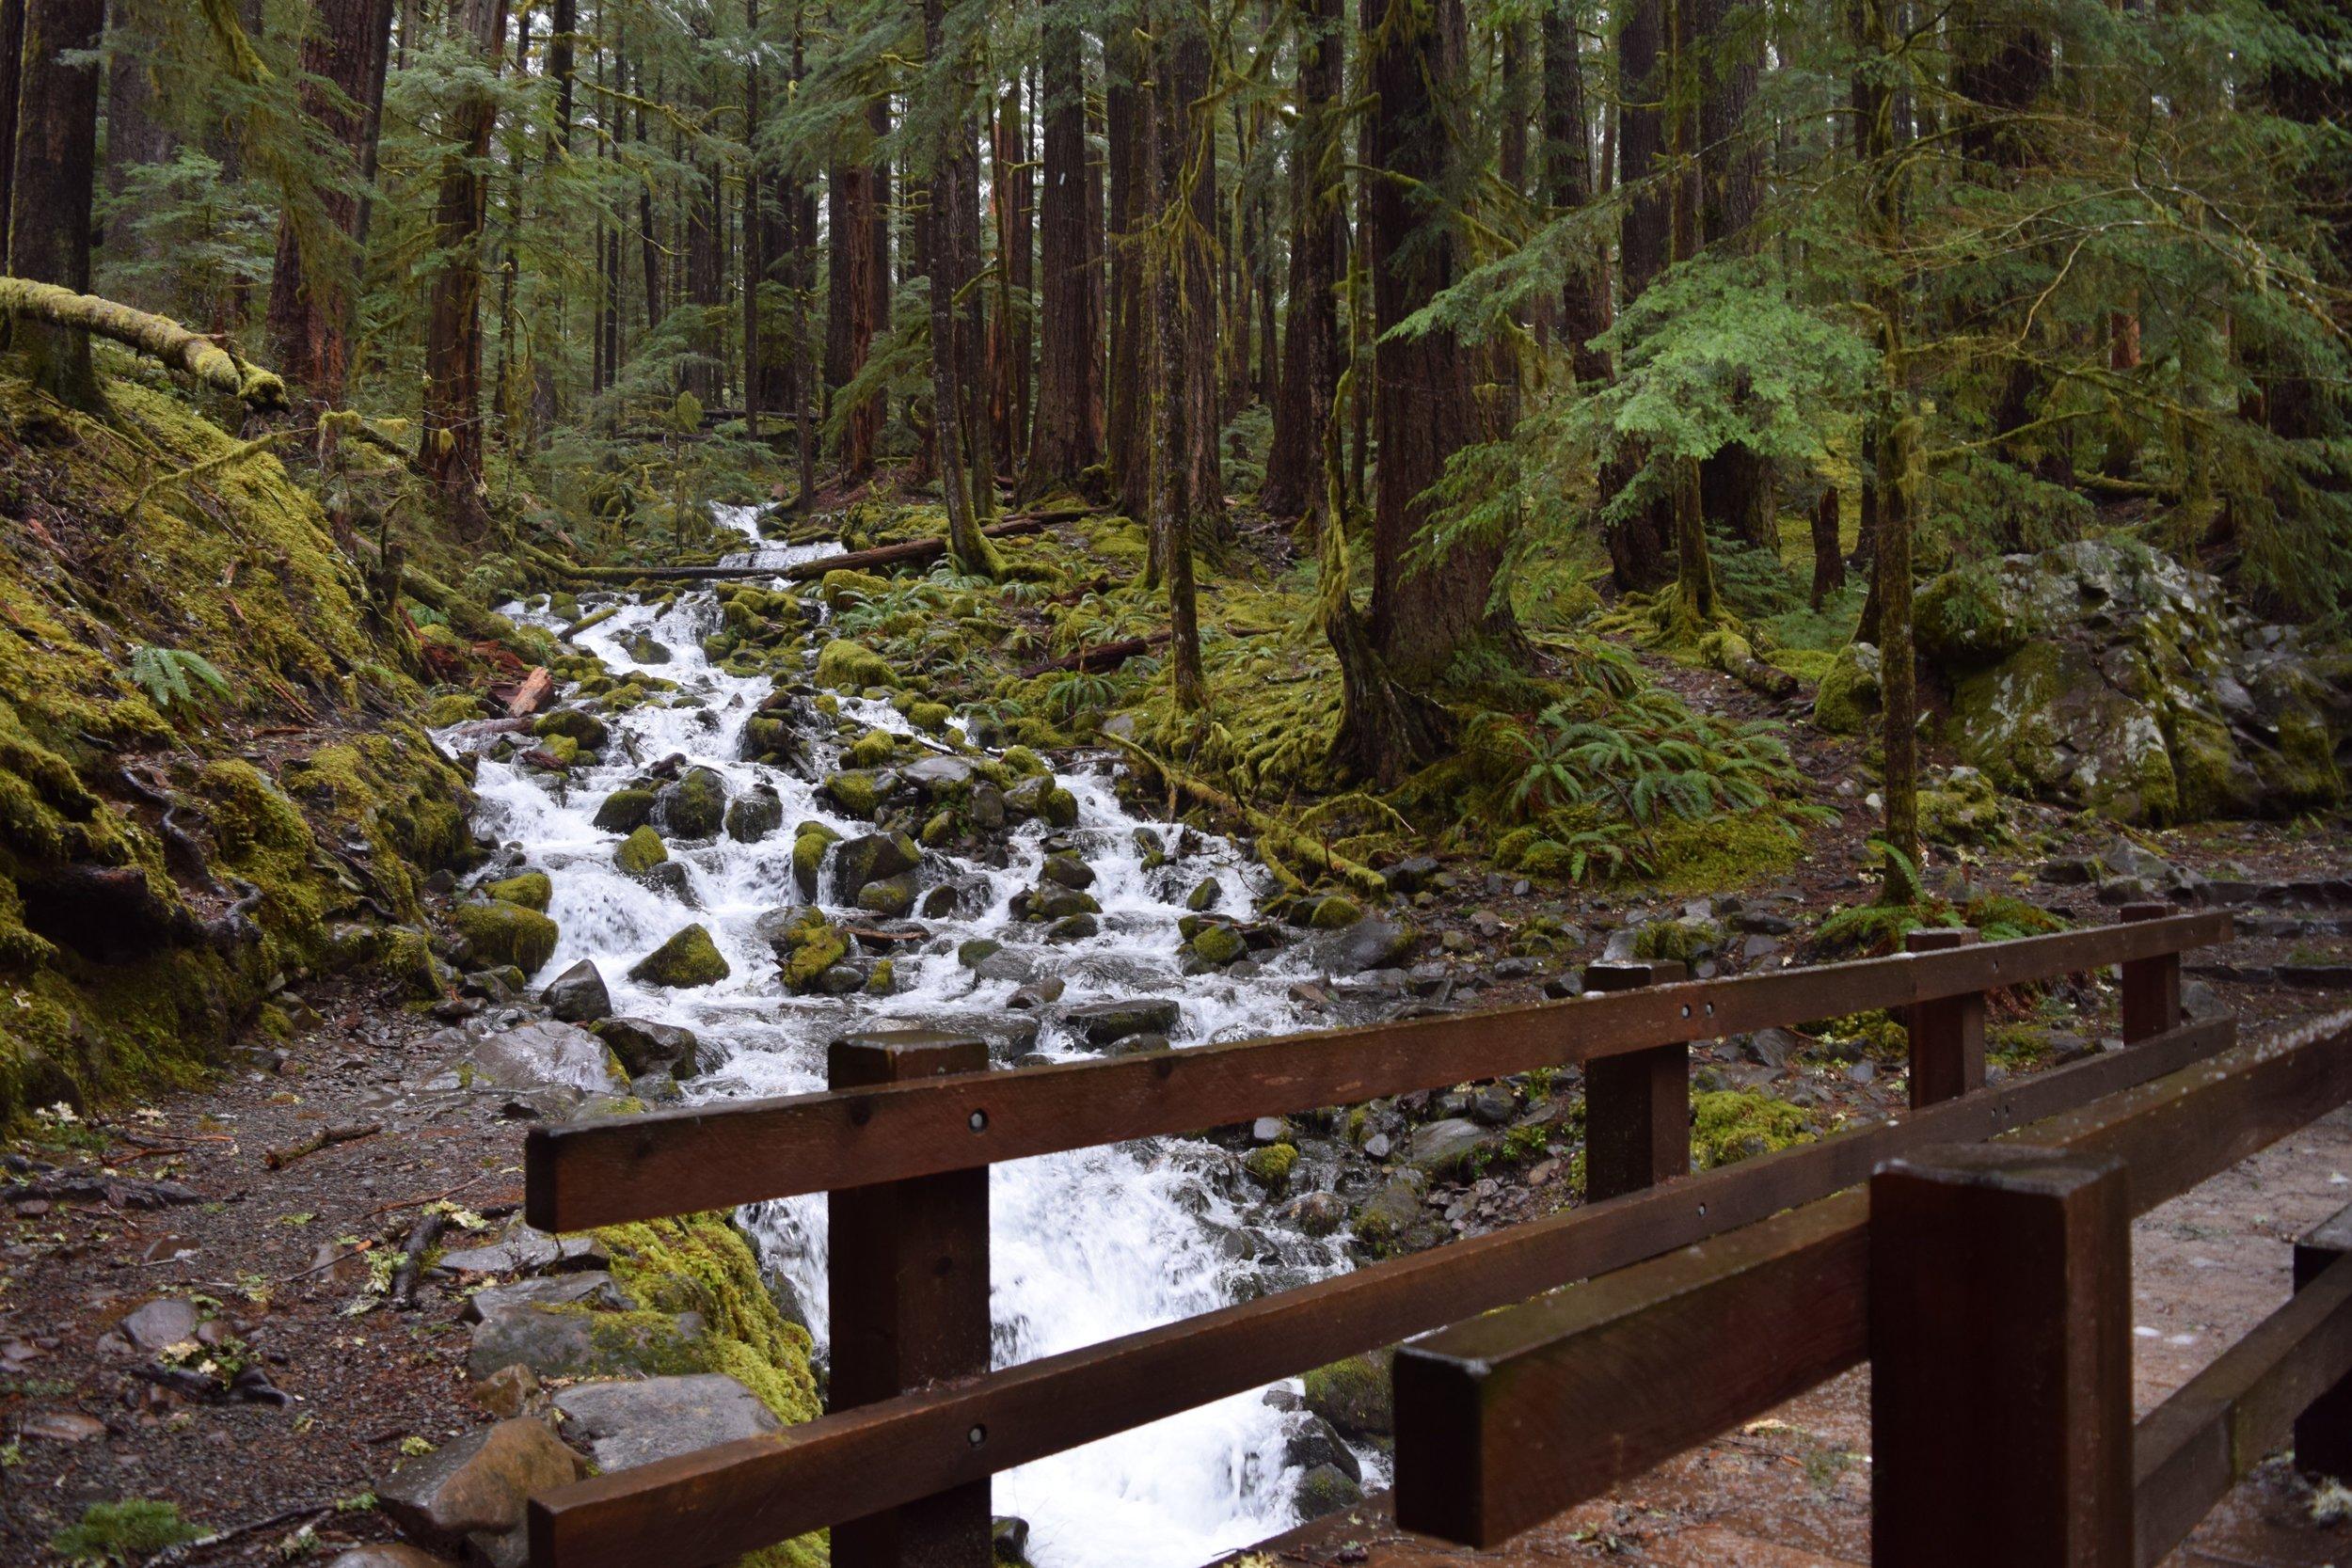 First nature bridge crossing